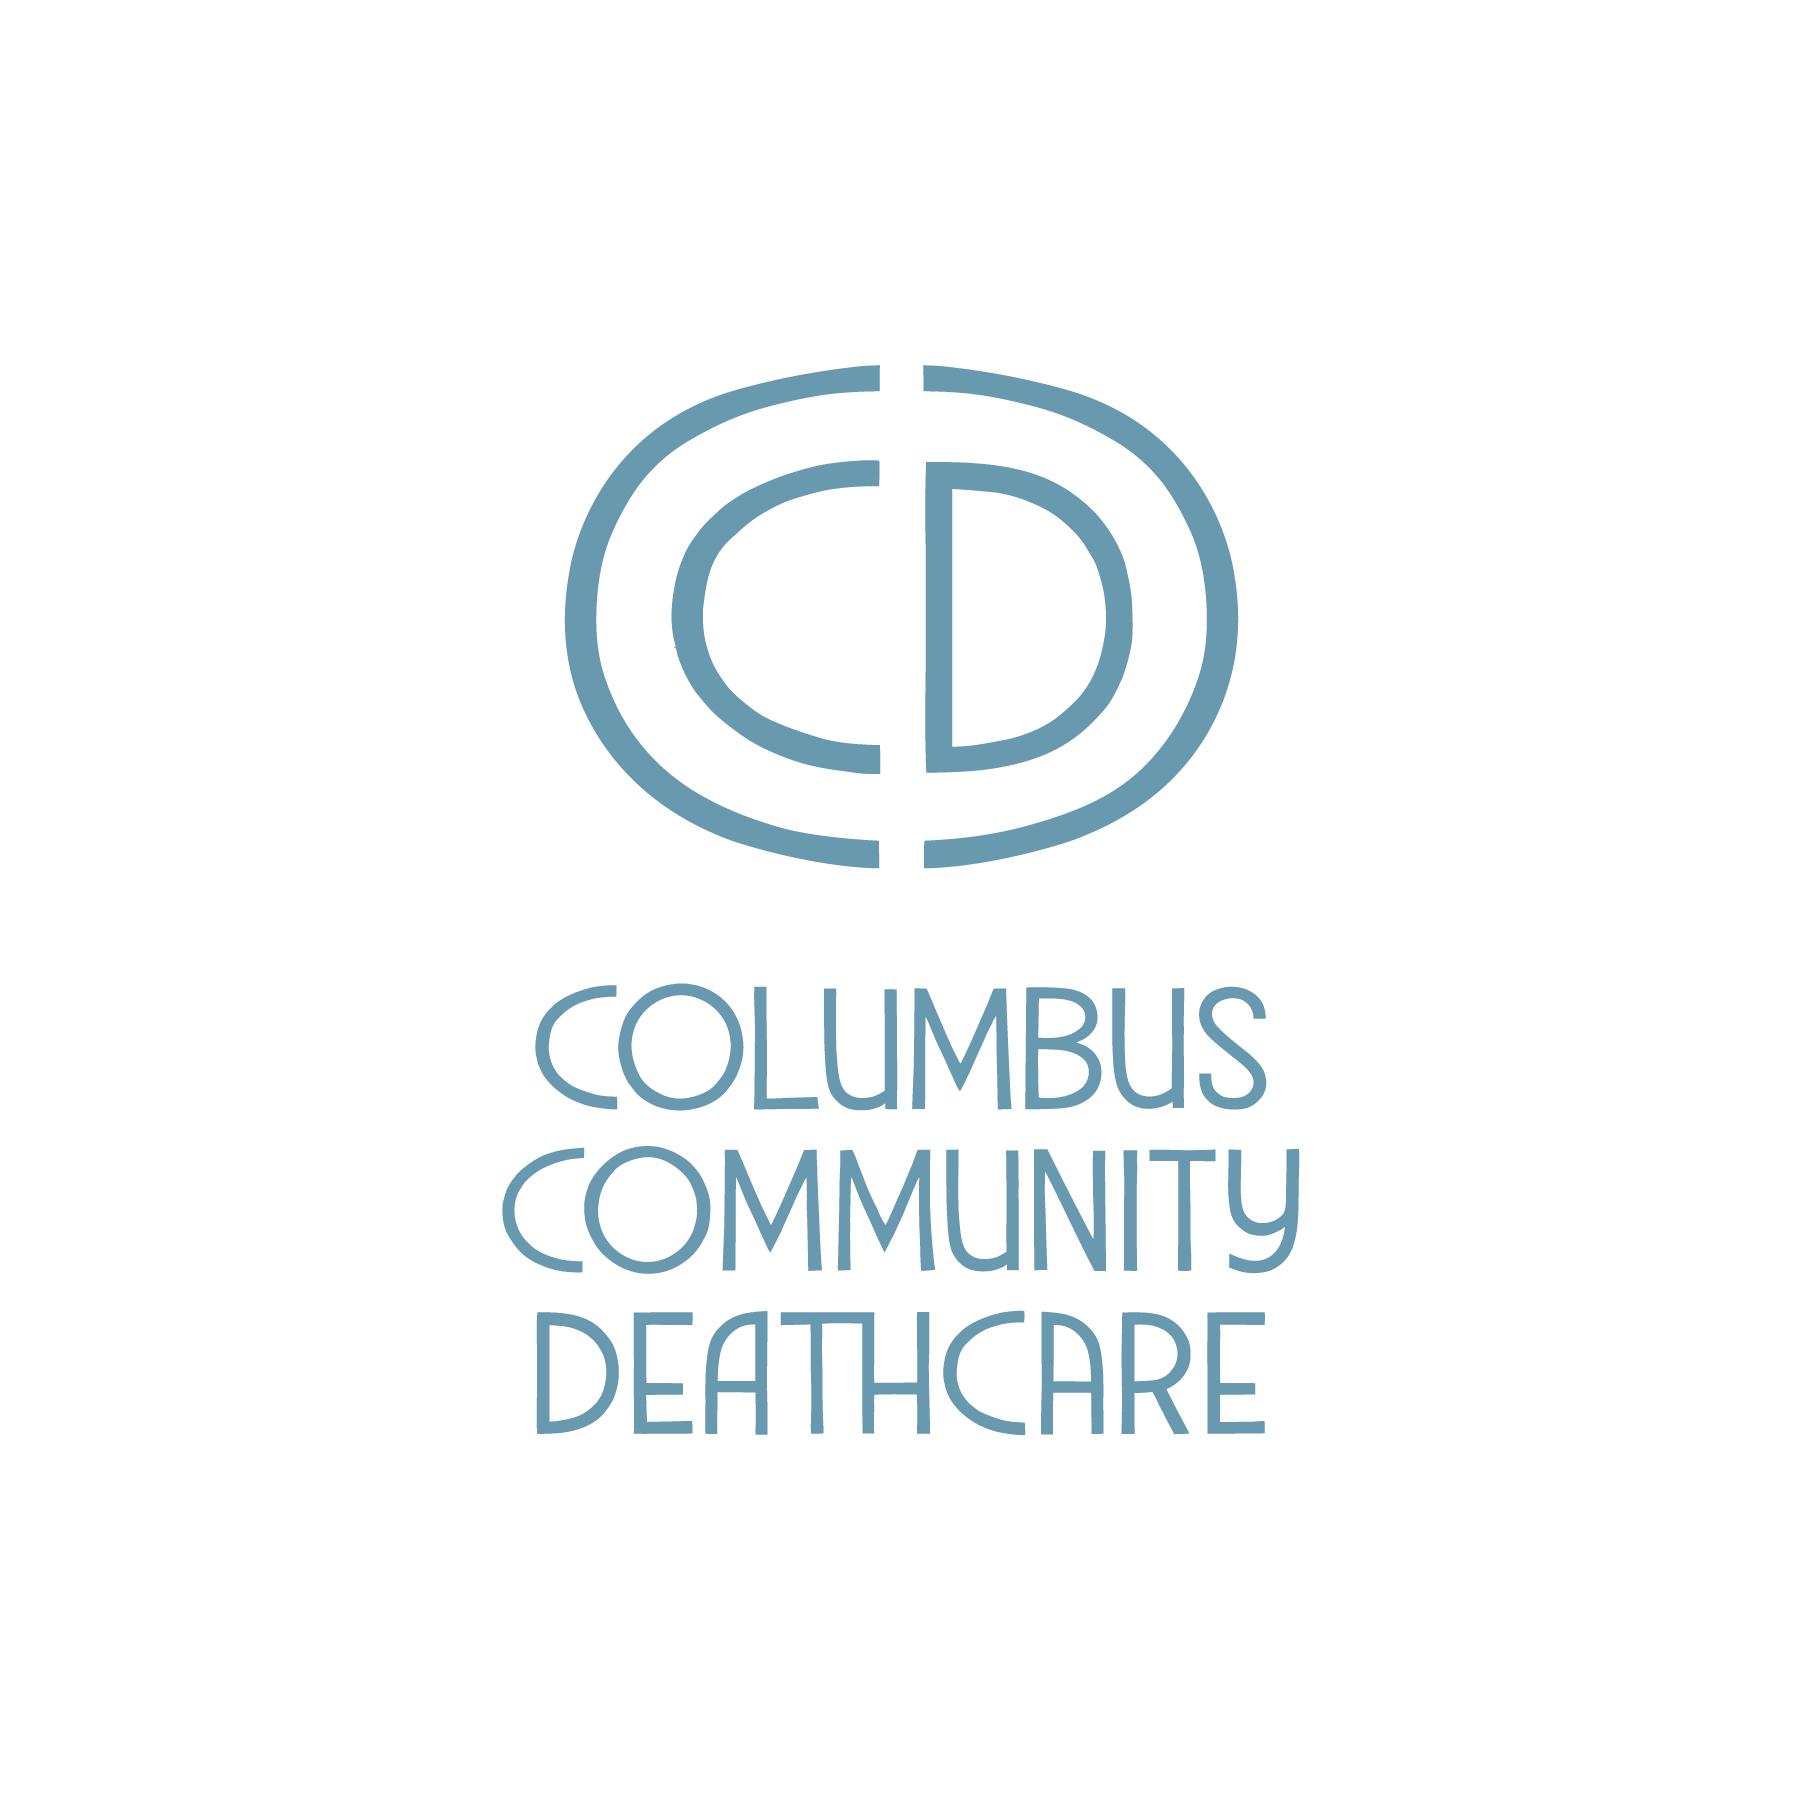 Columbus Community Deathcare